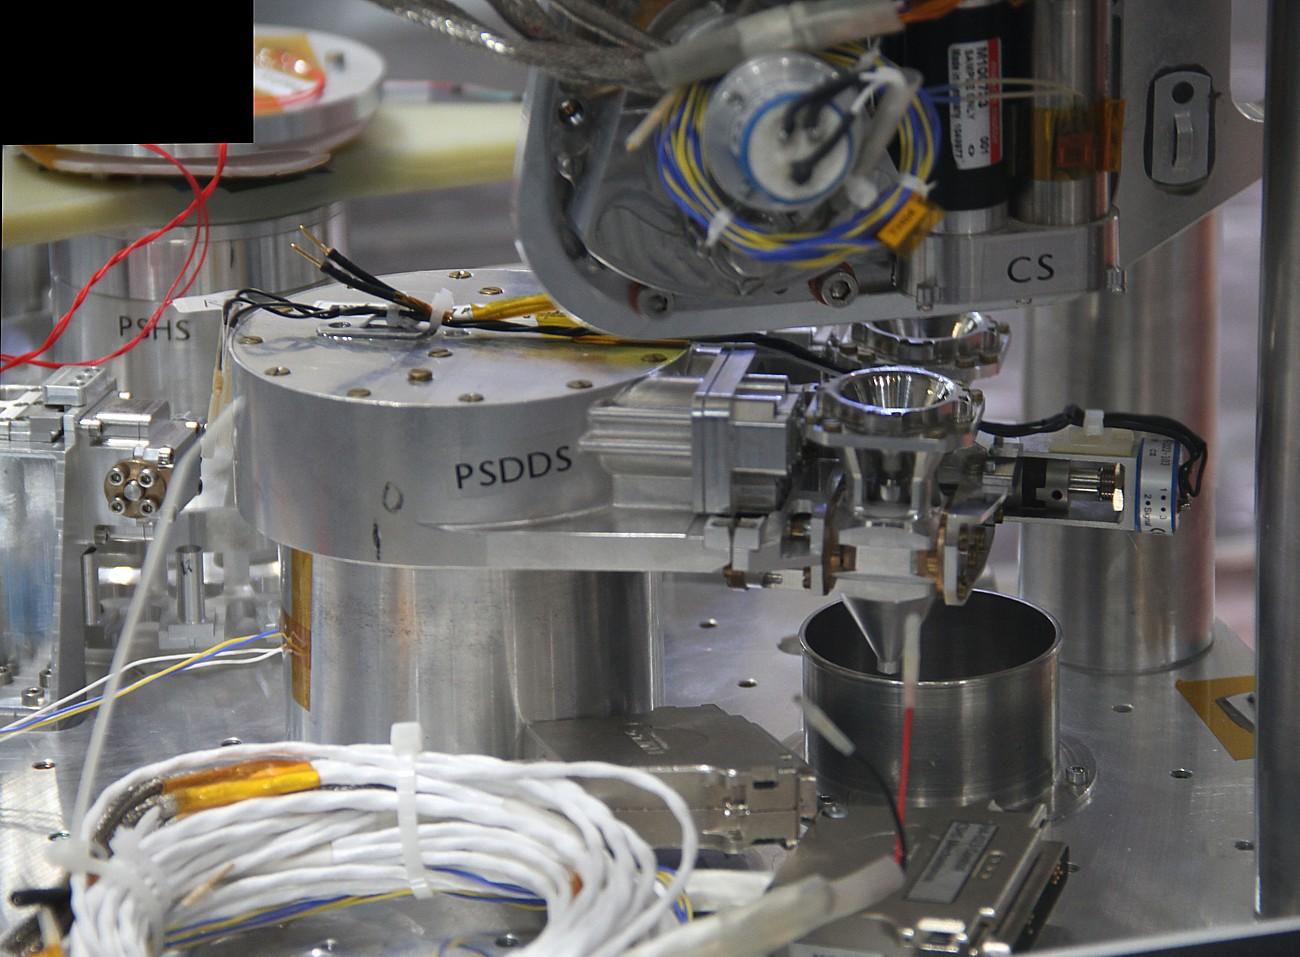 15 06 19 - 17h 05m 24s - bourget ohb syst traitement echantillons exomars_stitch r